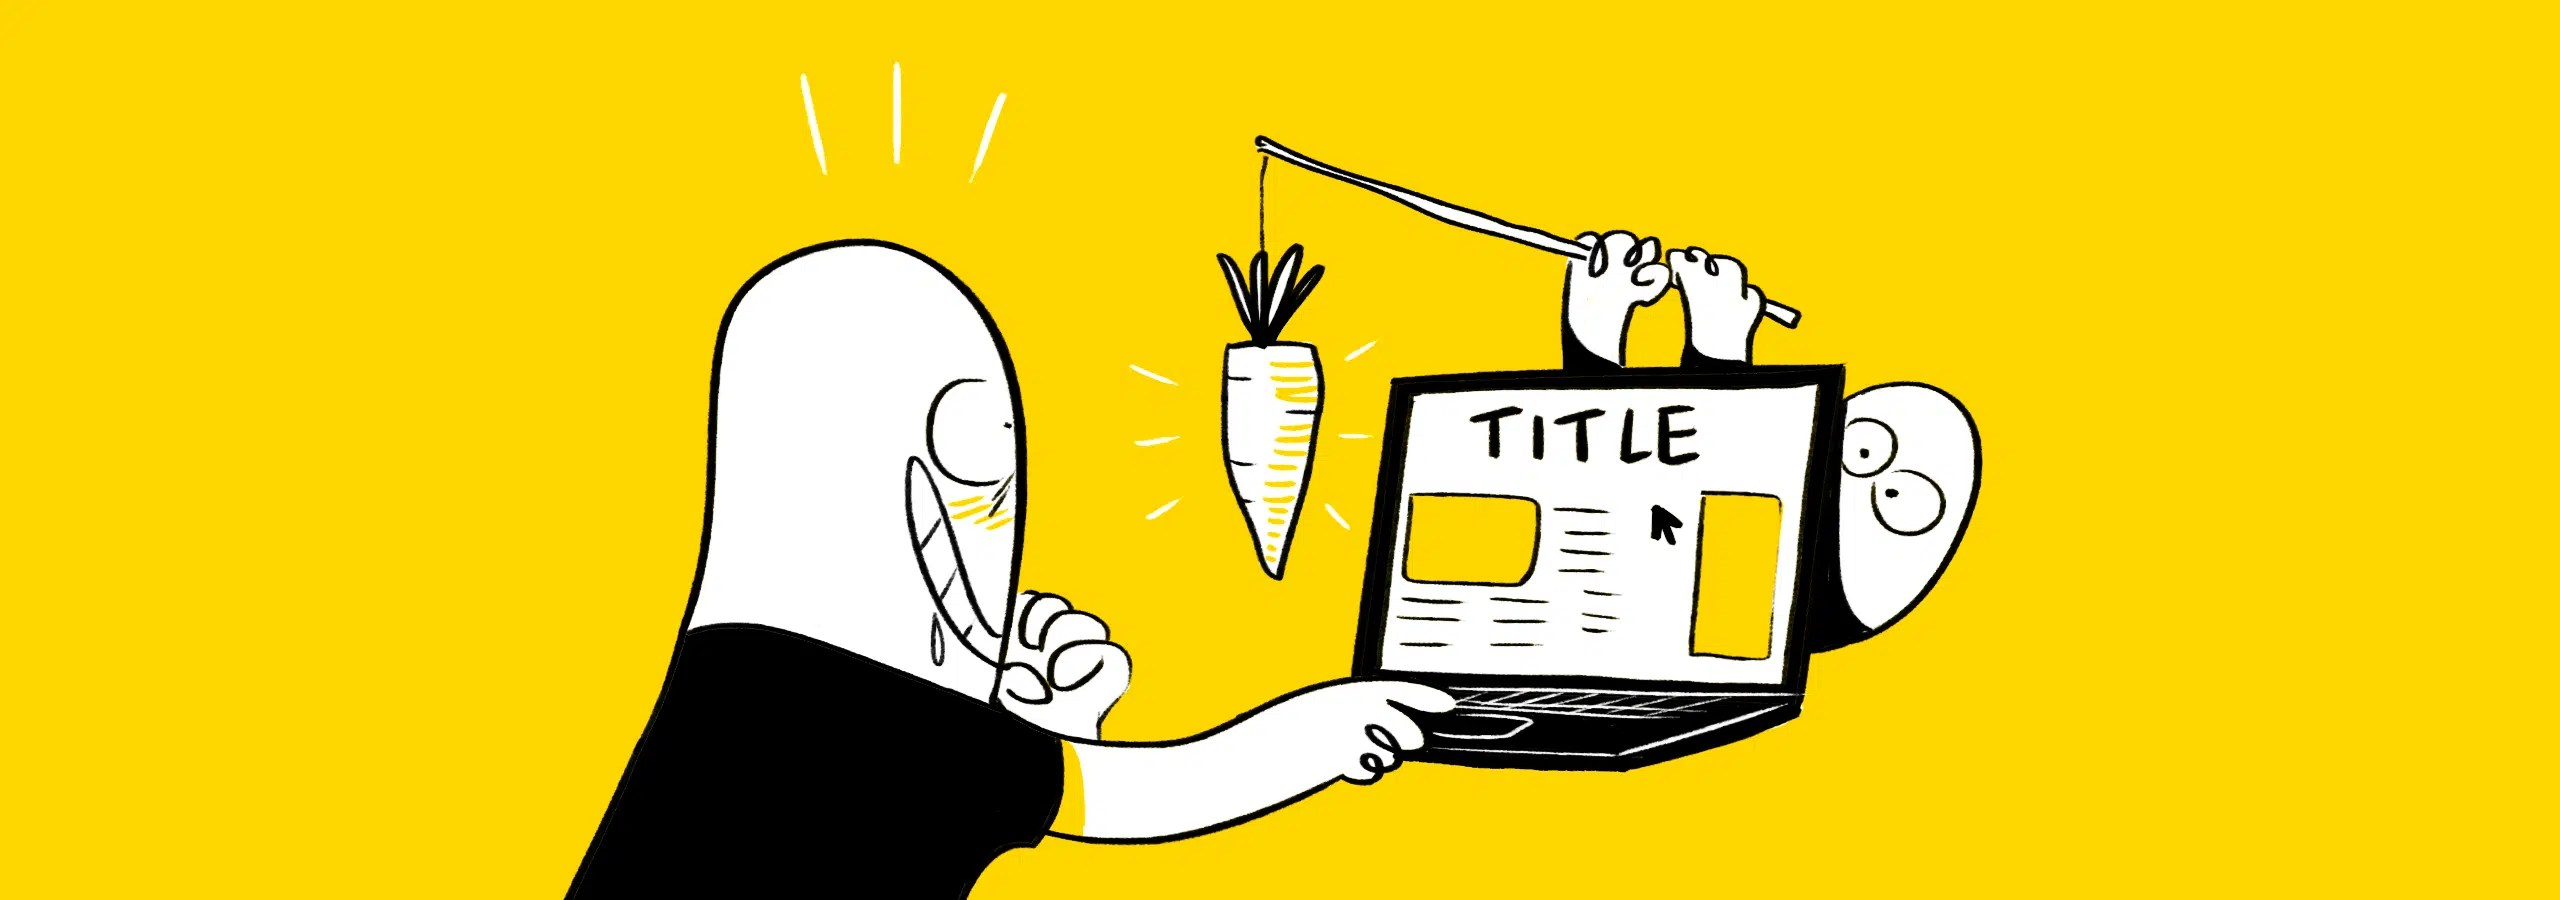 cartoonbase_blog_headlines